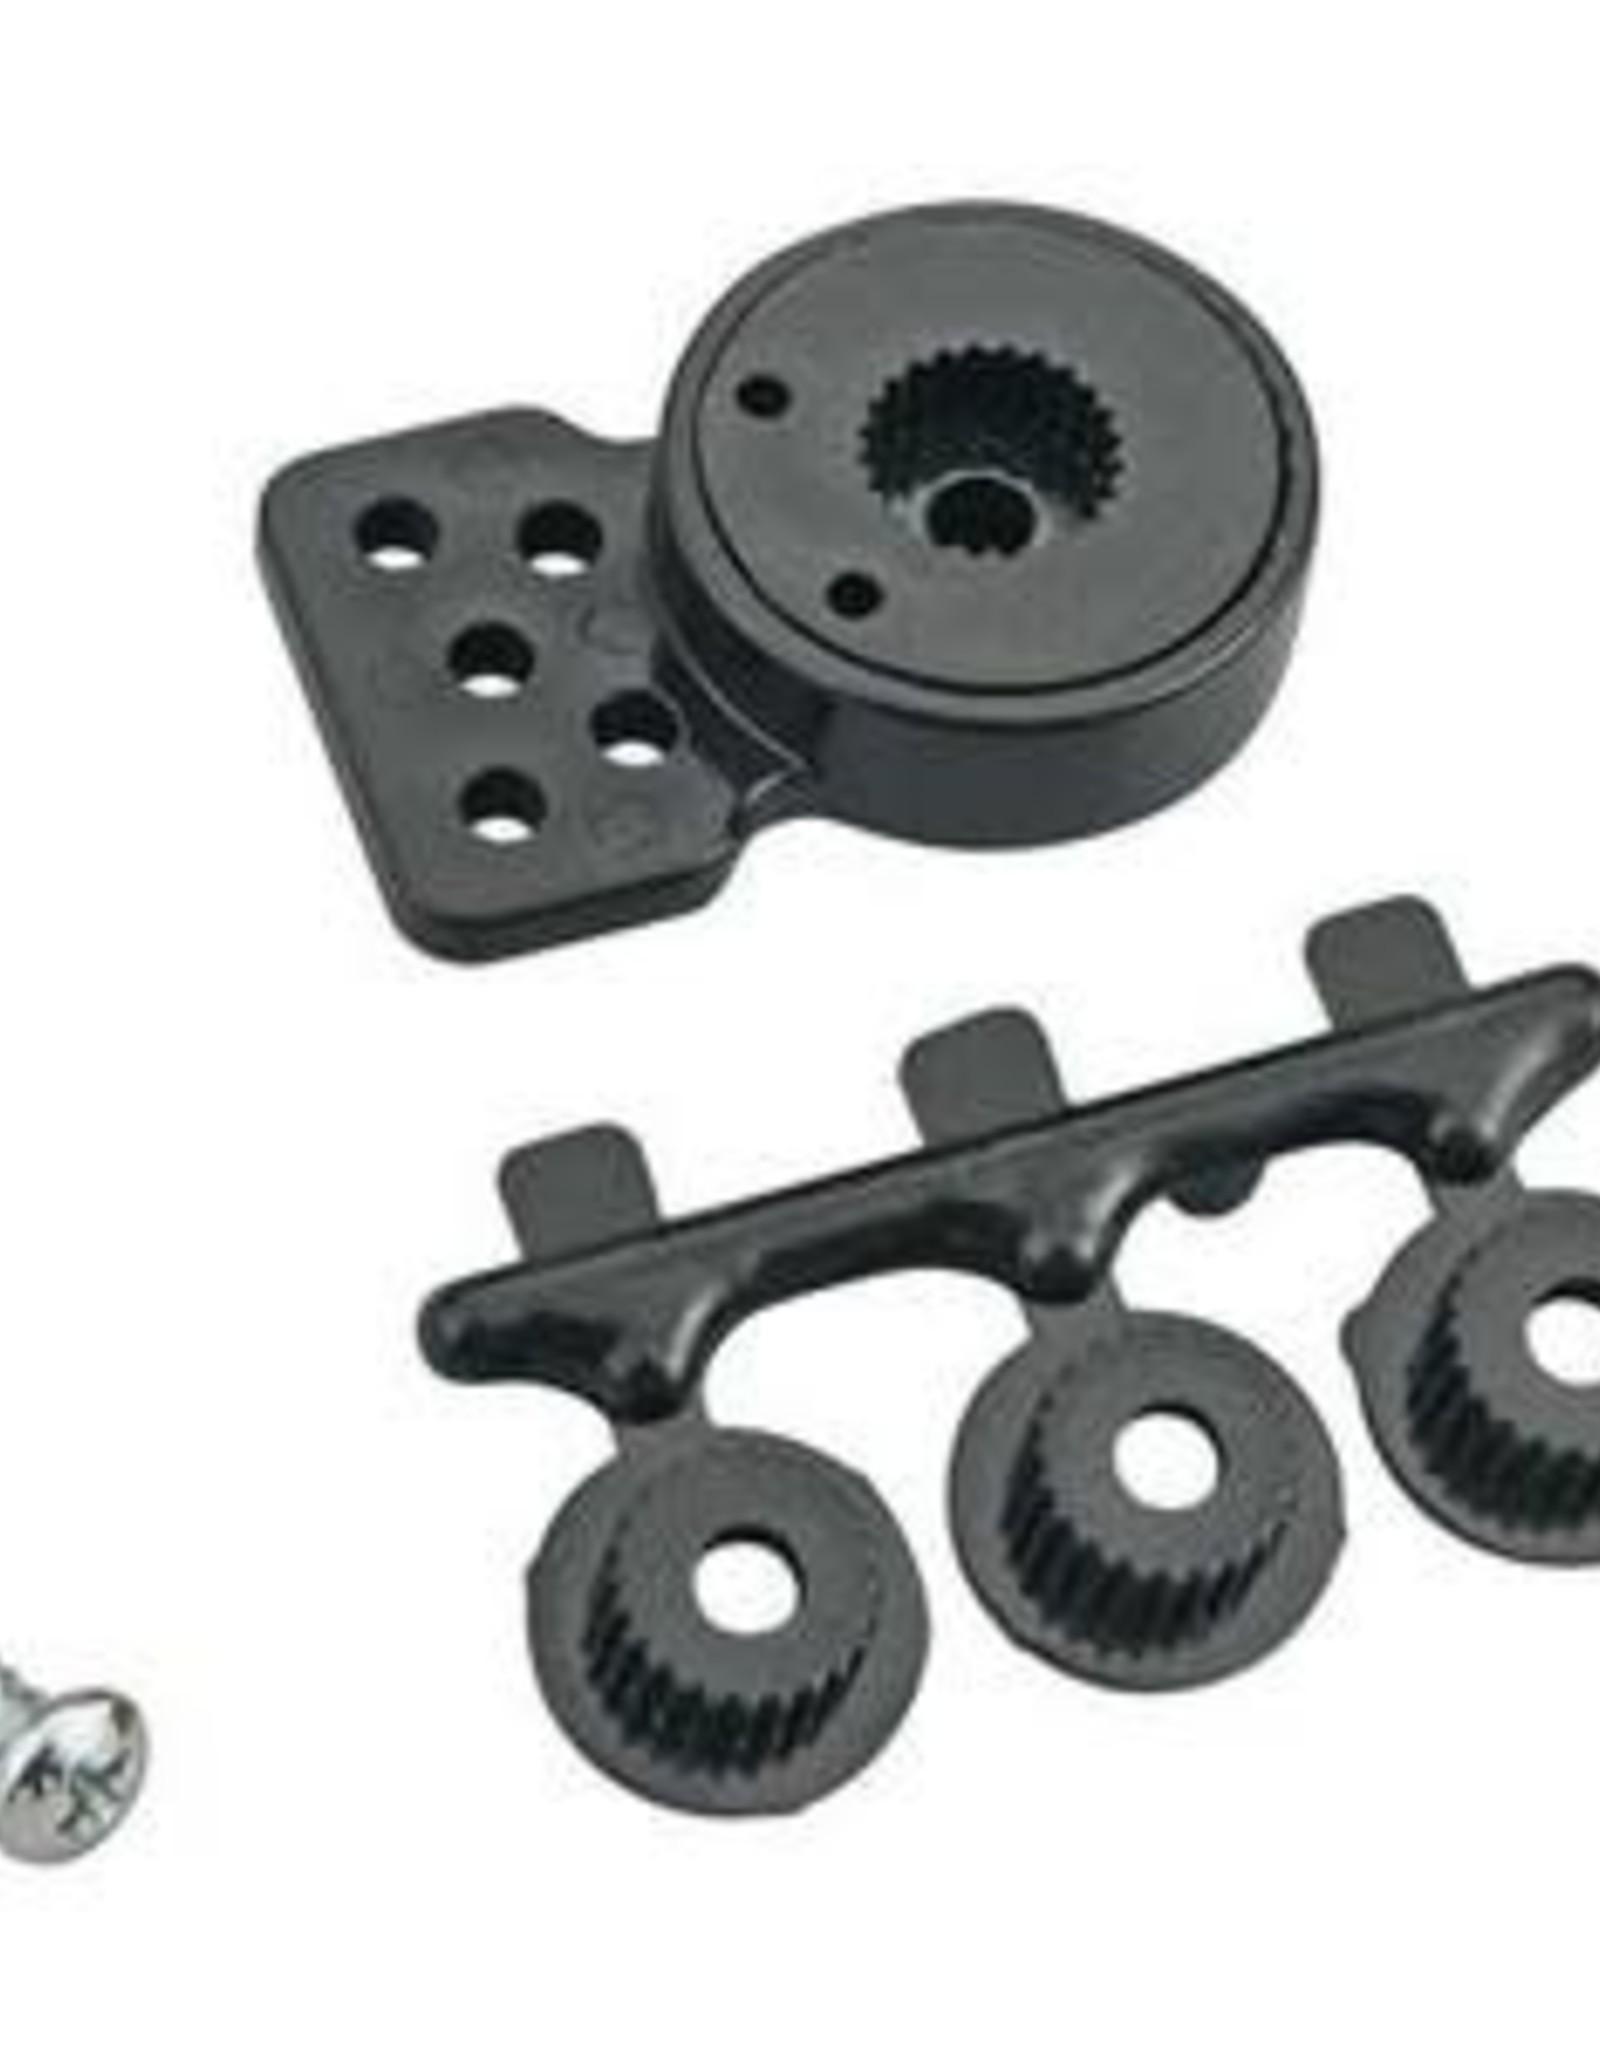 kimbrough Mid-Size Servo Saver w/ holes 23, 24 & 25 Spline Drive